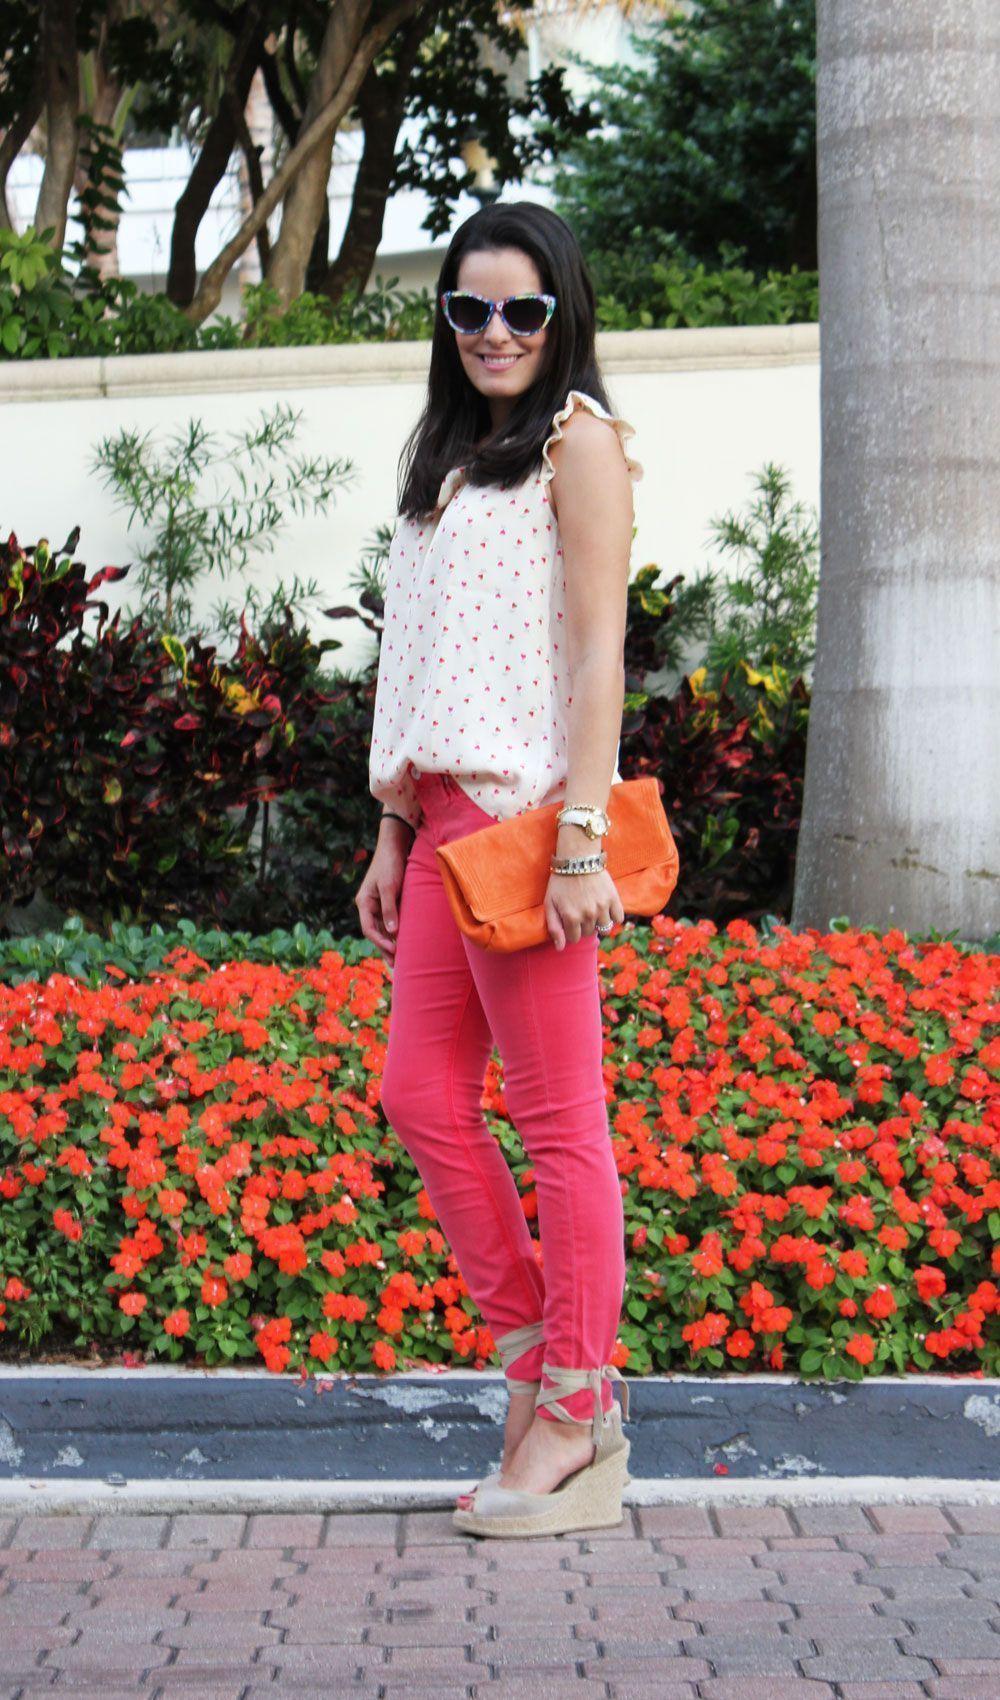 "Foto: Reprodução / <a href=""http://www.blogdamariah.com.br/index.php/2012/01/look-do-dia-skinny-colorida/?lang=en"" target=""_blank"">Blog da Mariah</a>"